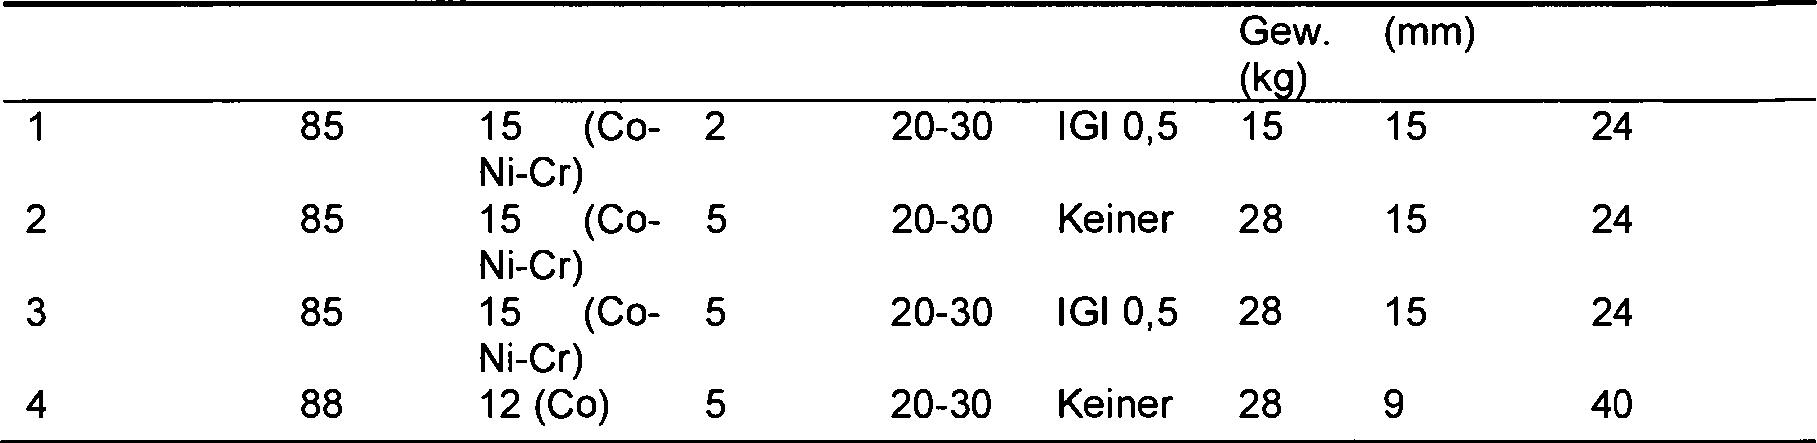 Berühmt Xhhw Draht Spezifikationen Fotos - Schaltplan Serie Circuit ...